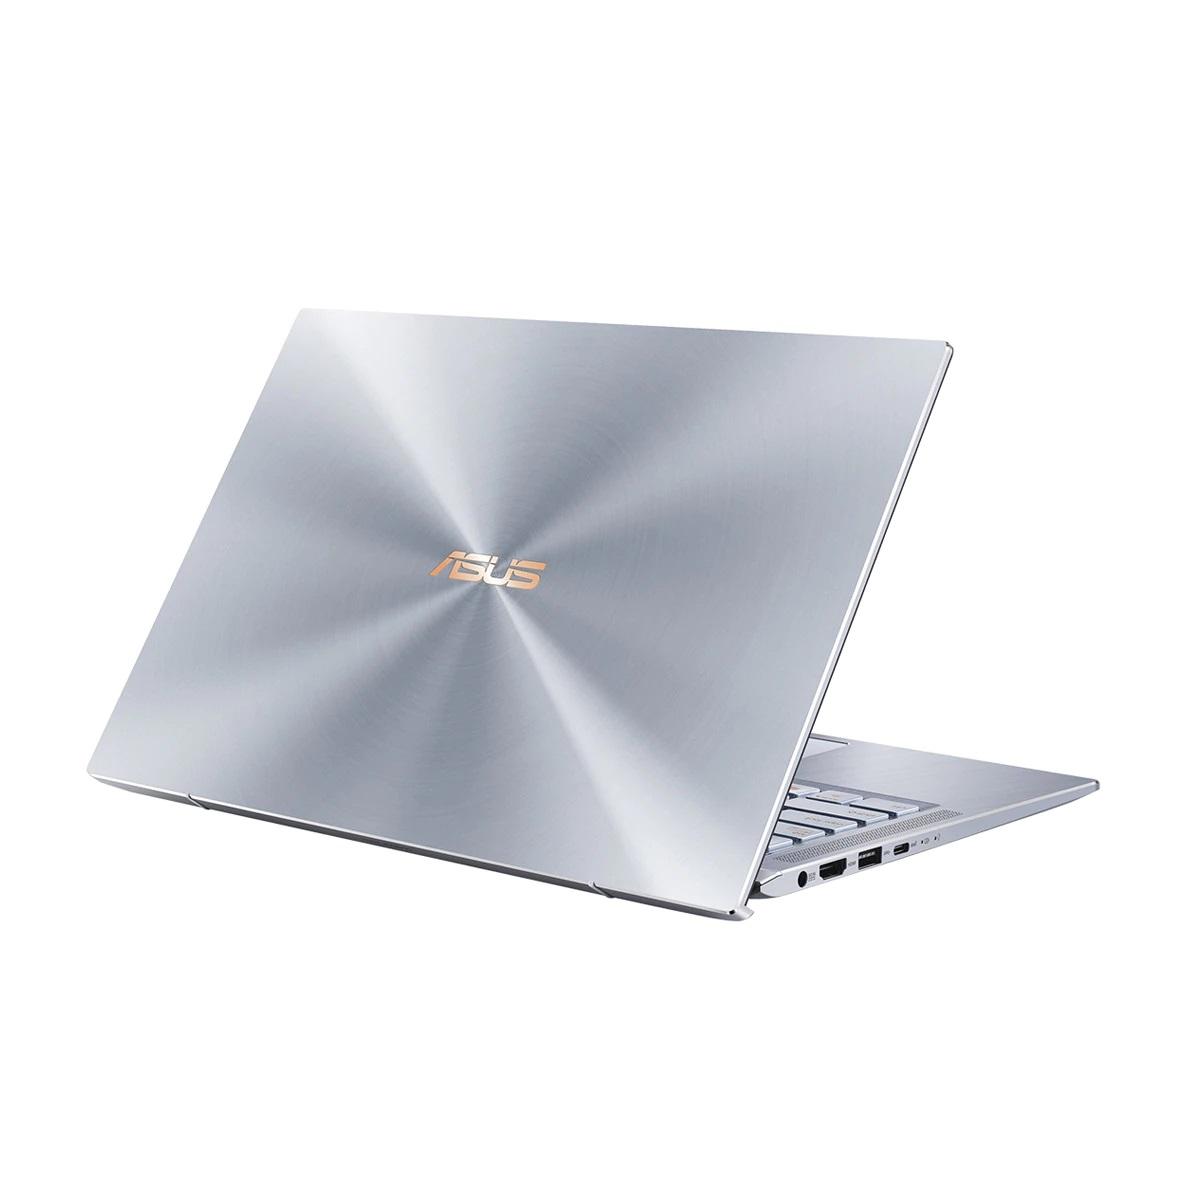 Portátil ASUS ZenBook 14 UM431DA-AM011T, AMD R5, 8 GB, 512 GB SSD, Radeon Vega 8